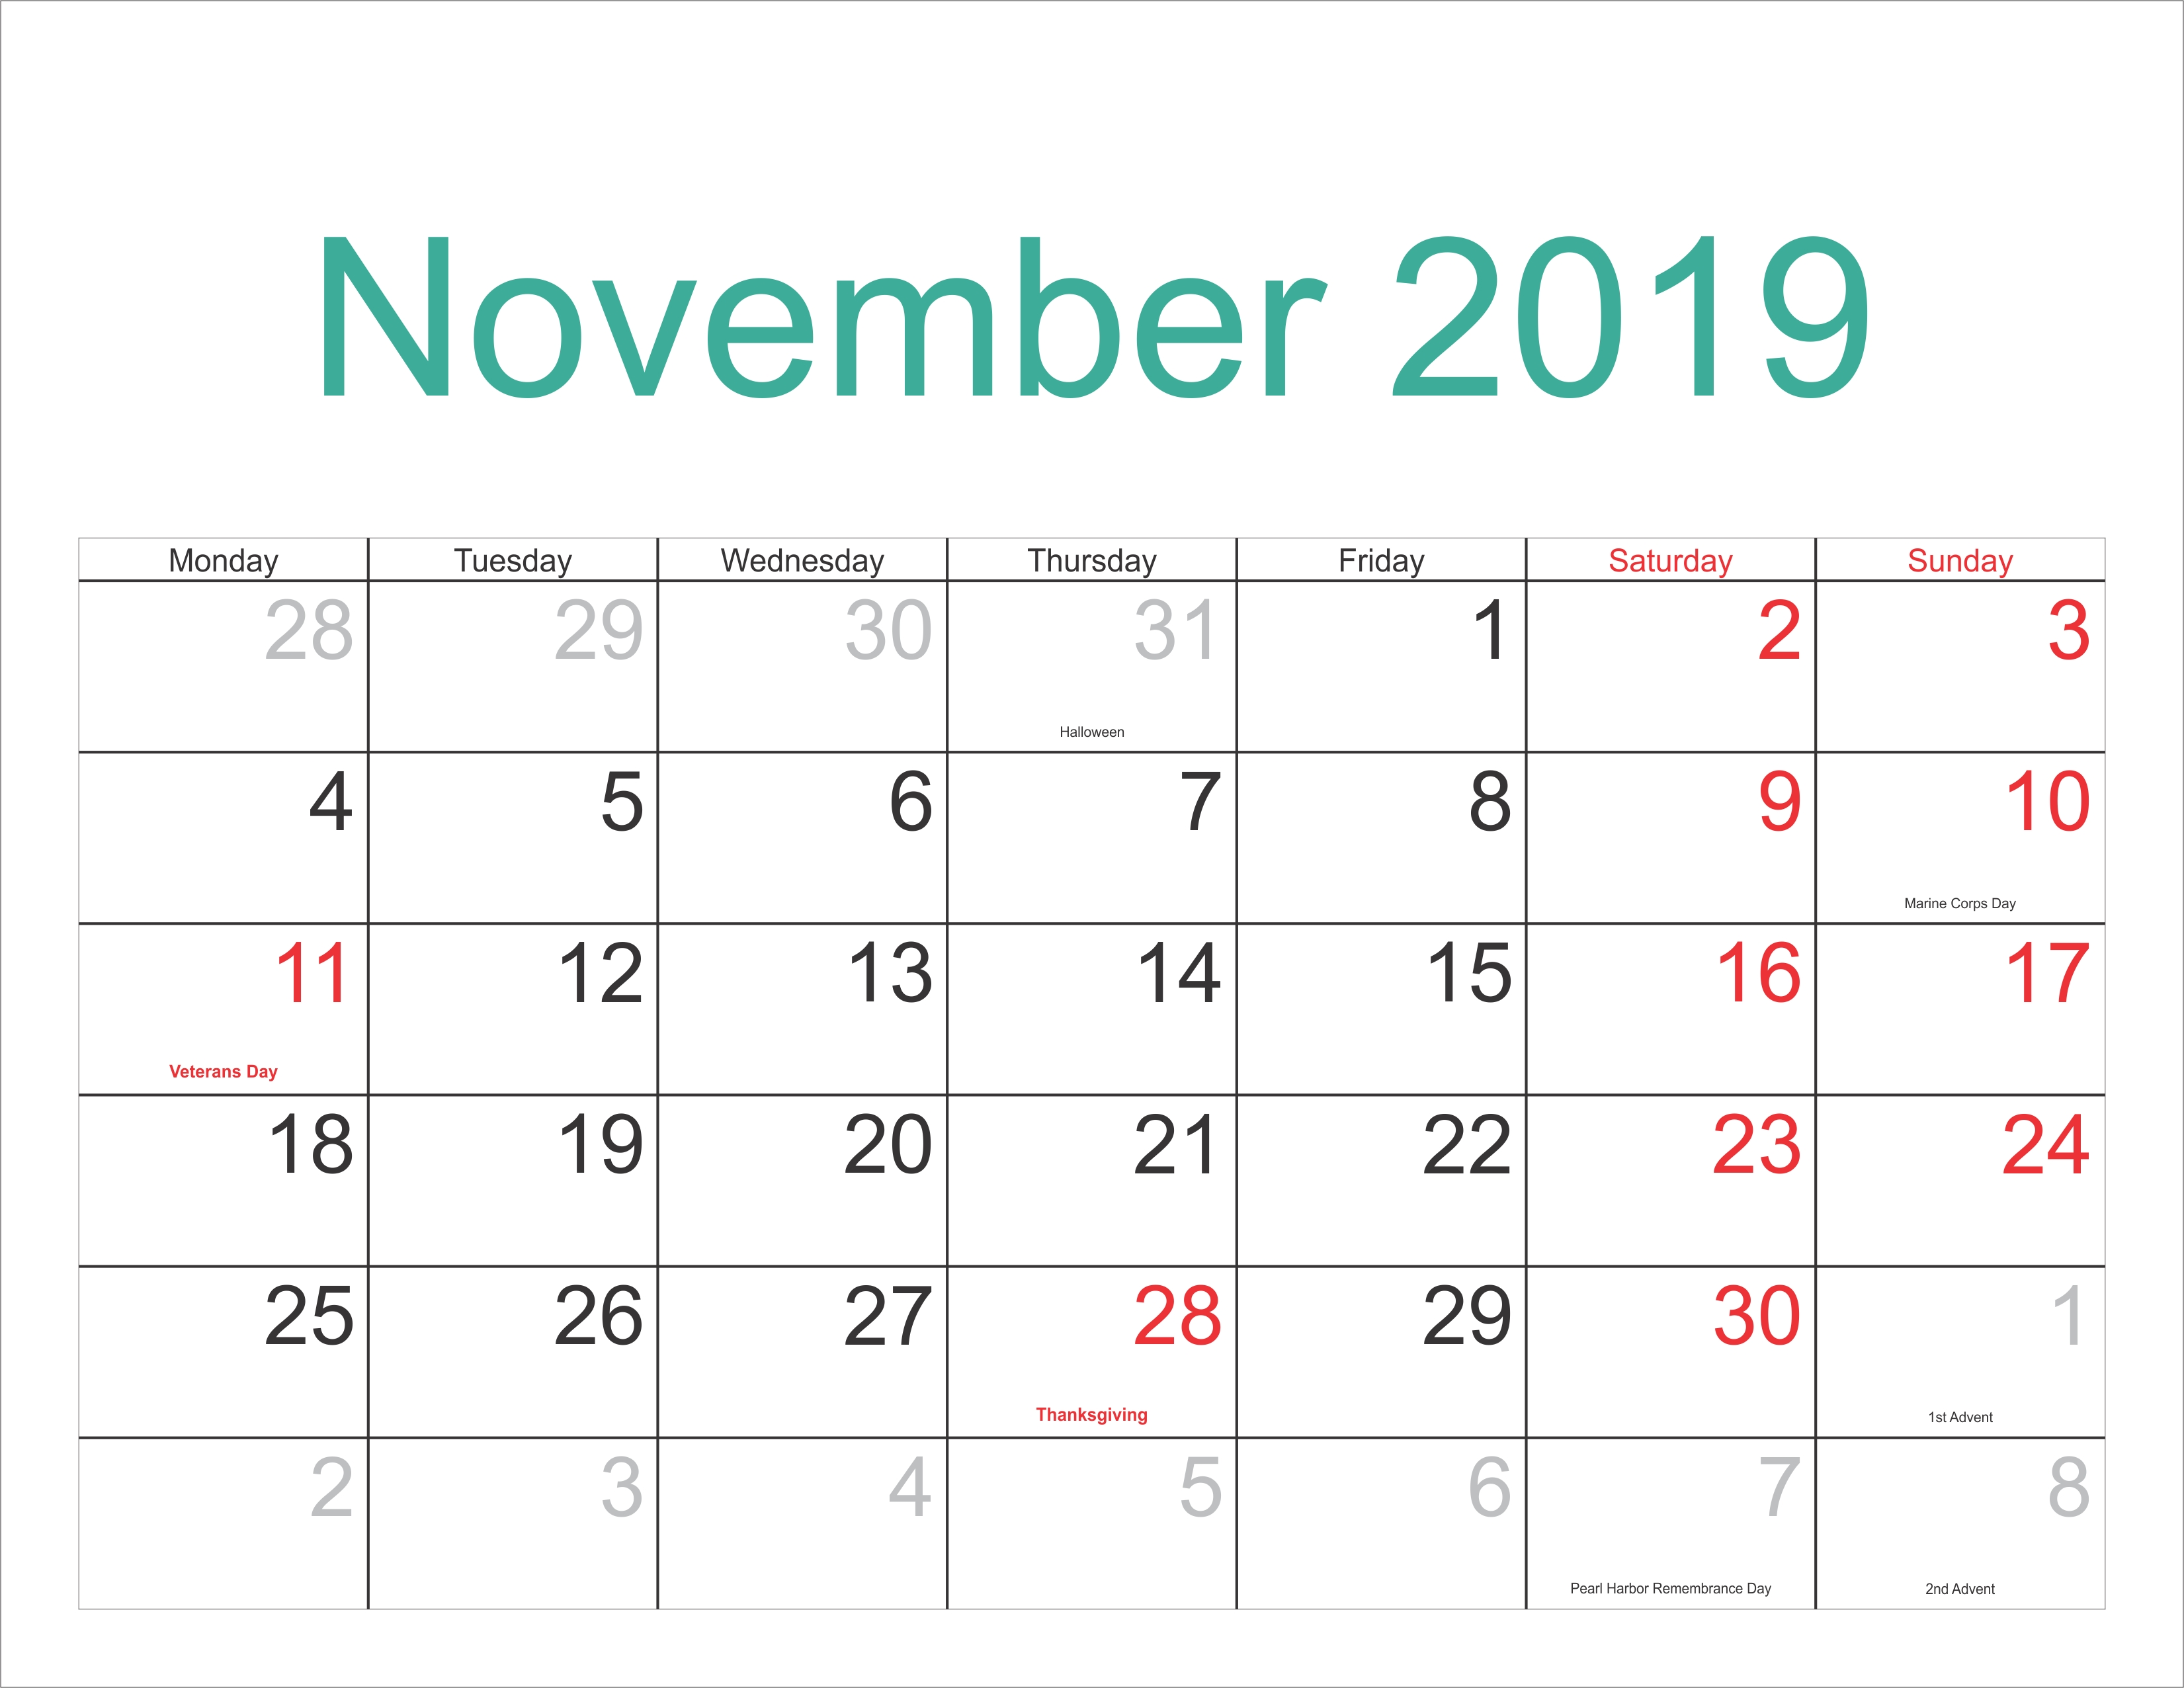 November 2019 Excel Calendar - Free November 2018 Calendar Calendar 2019 Excel Editable